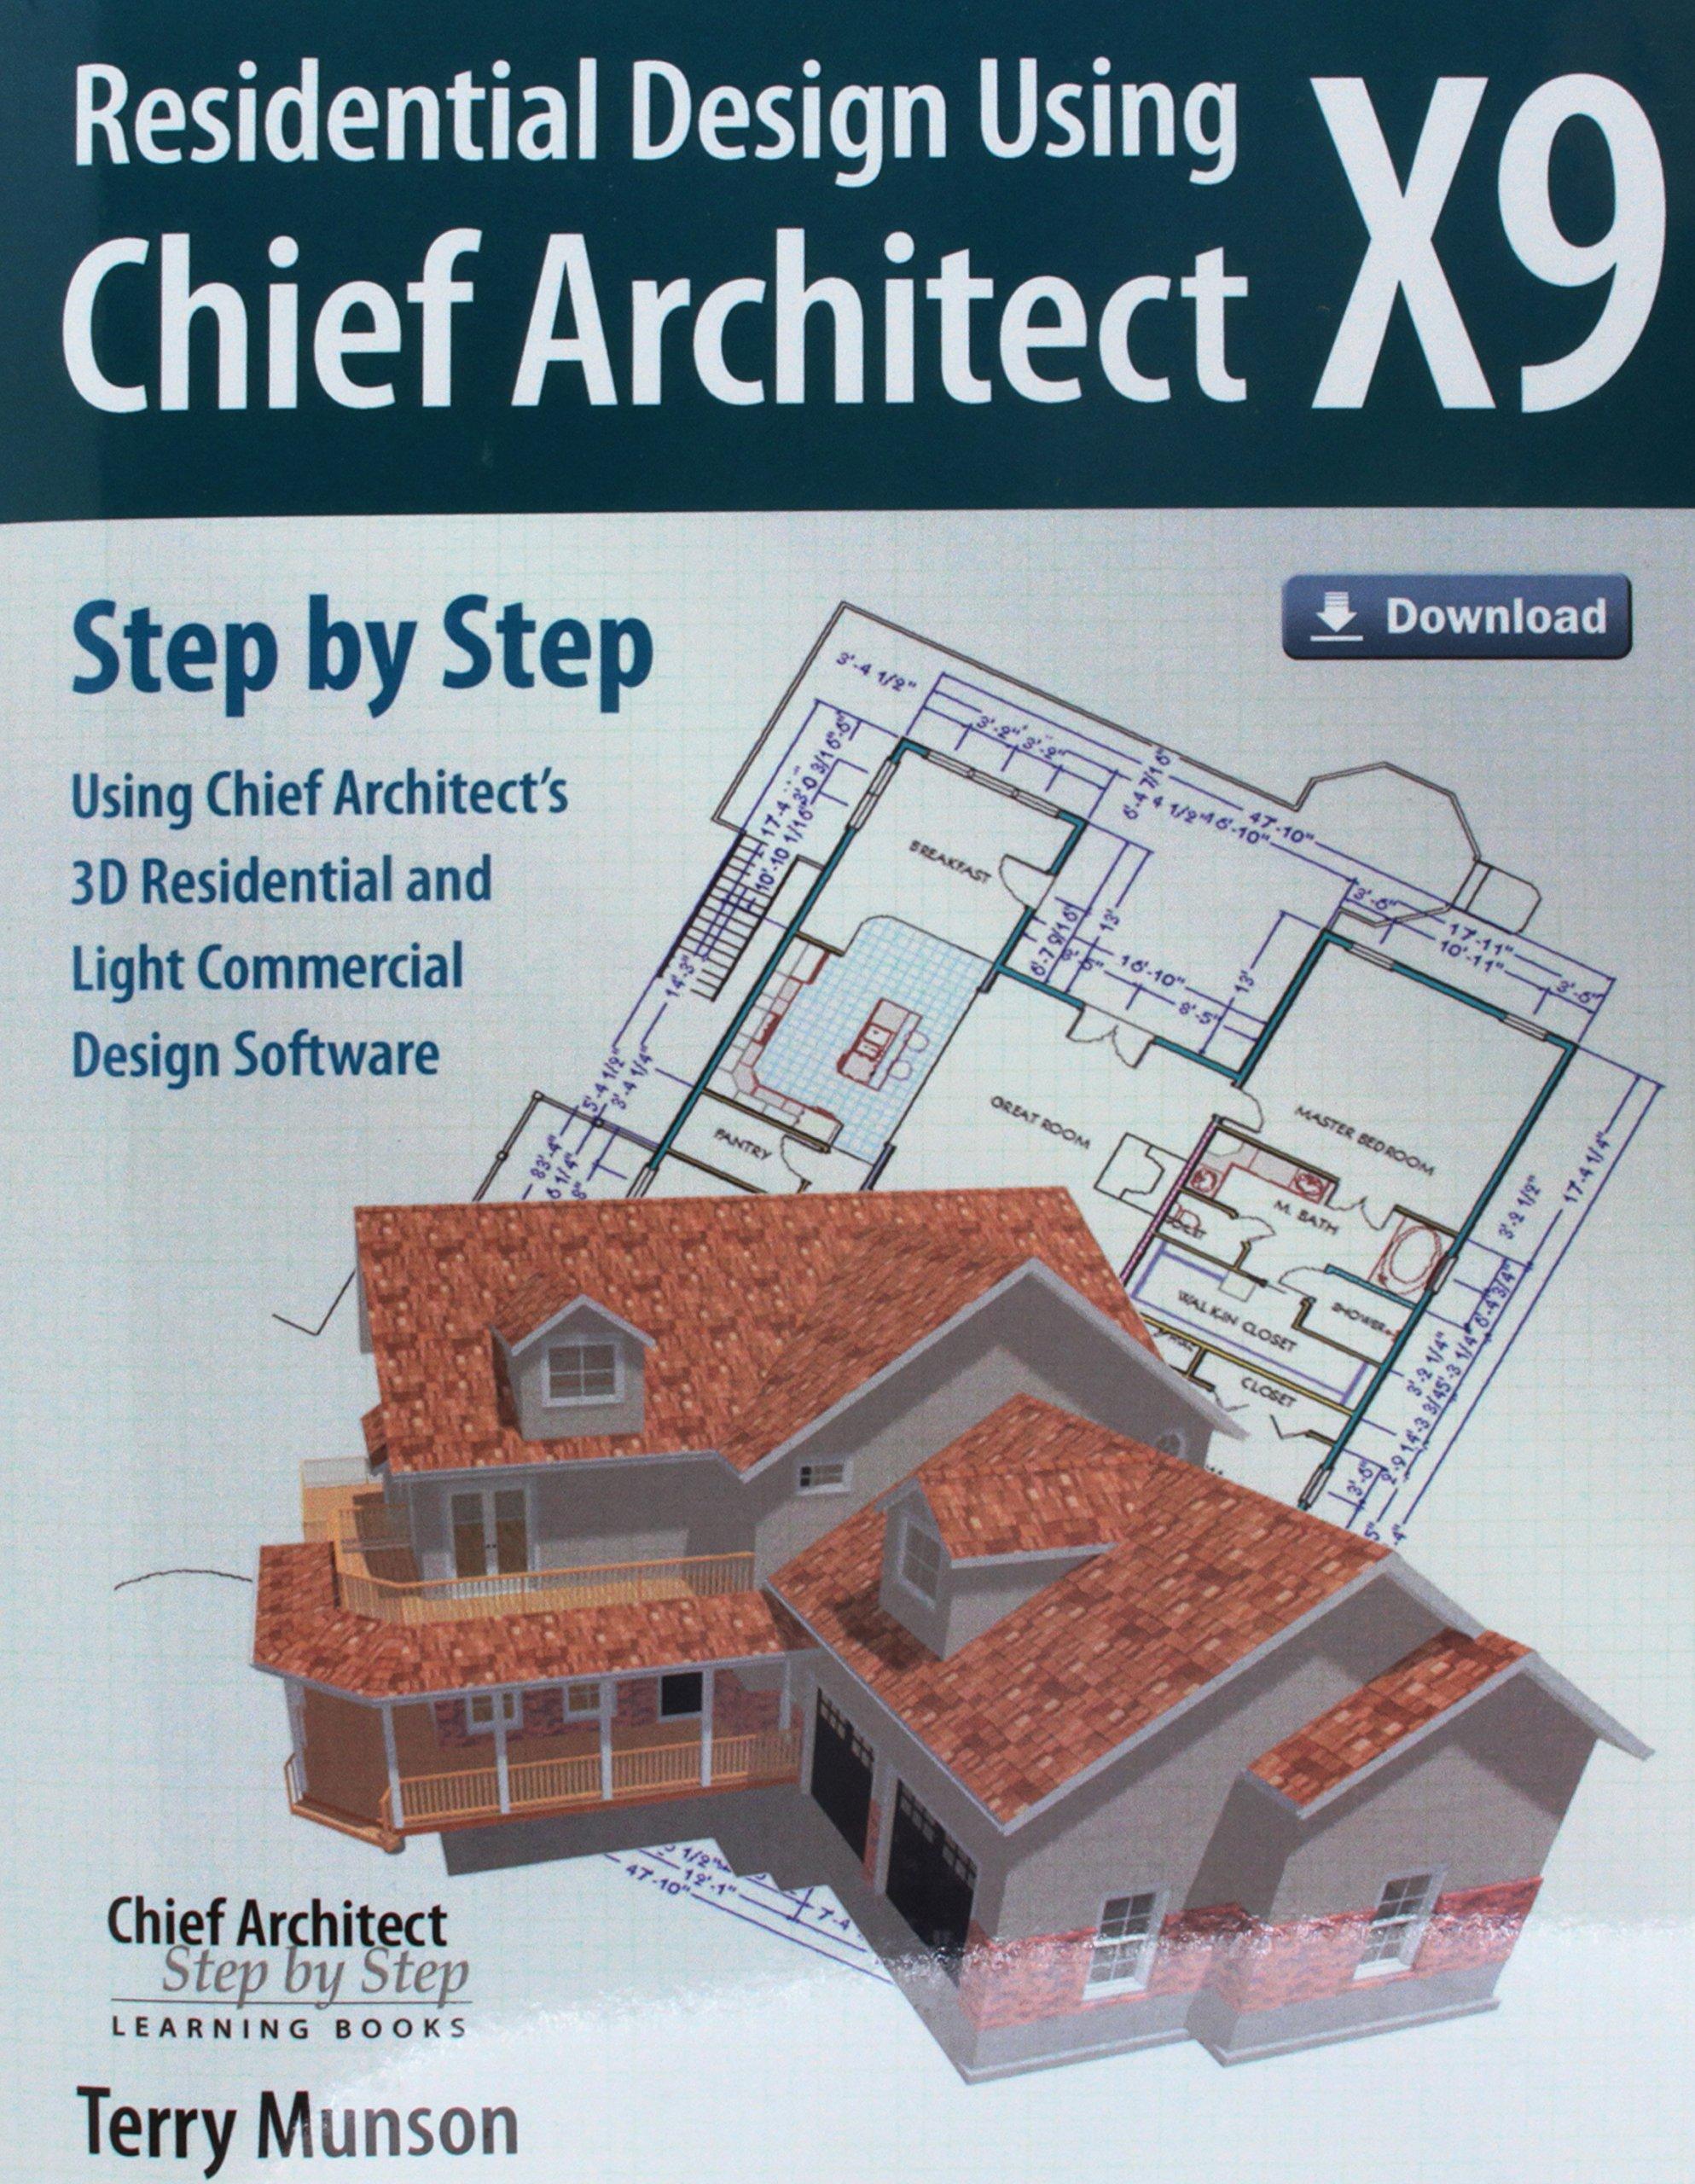 residential design using chief architect x9 terry munson residential design using chief architect x9 terry munson 9780692875964 amazon com books